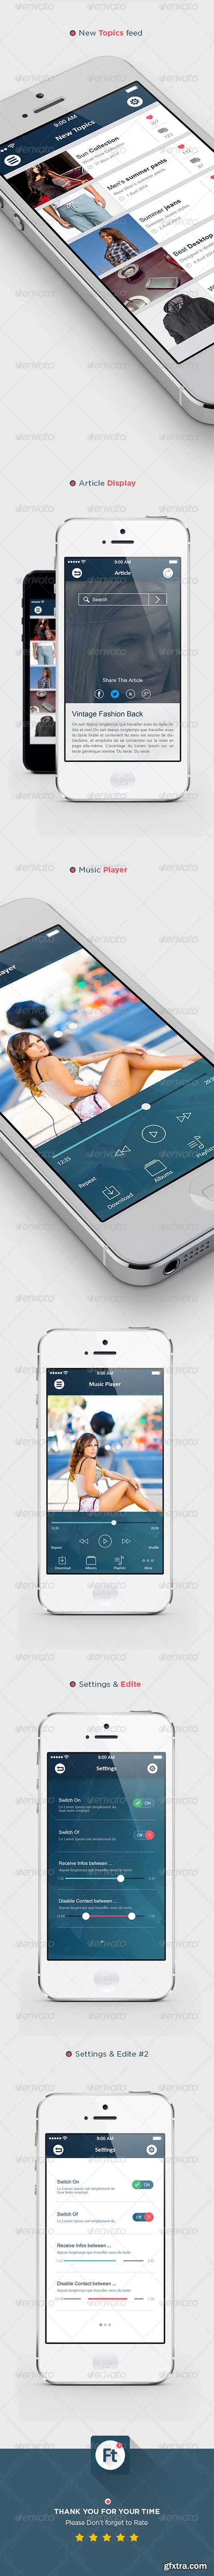 GraphicRiver Flat Modern Transparent App Ui kit 7375722